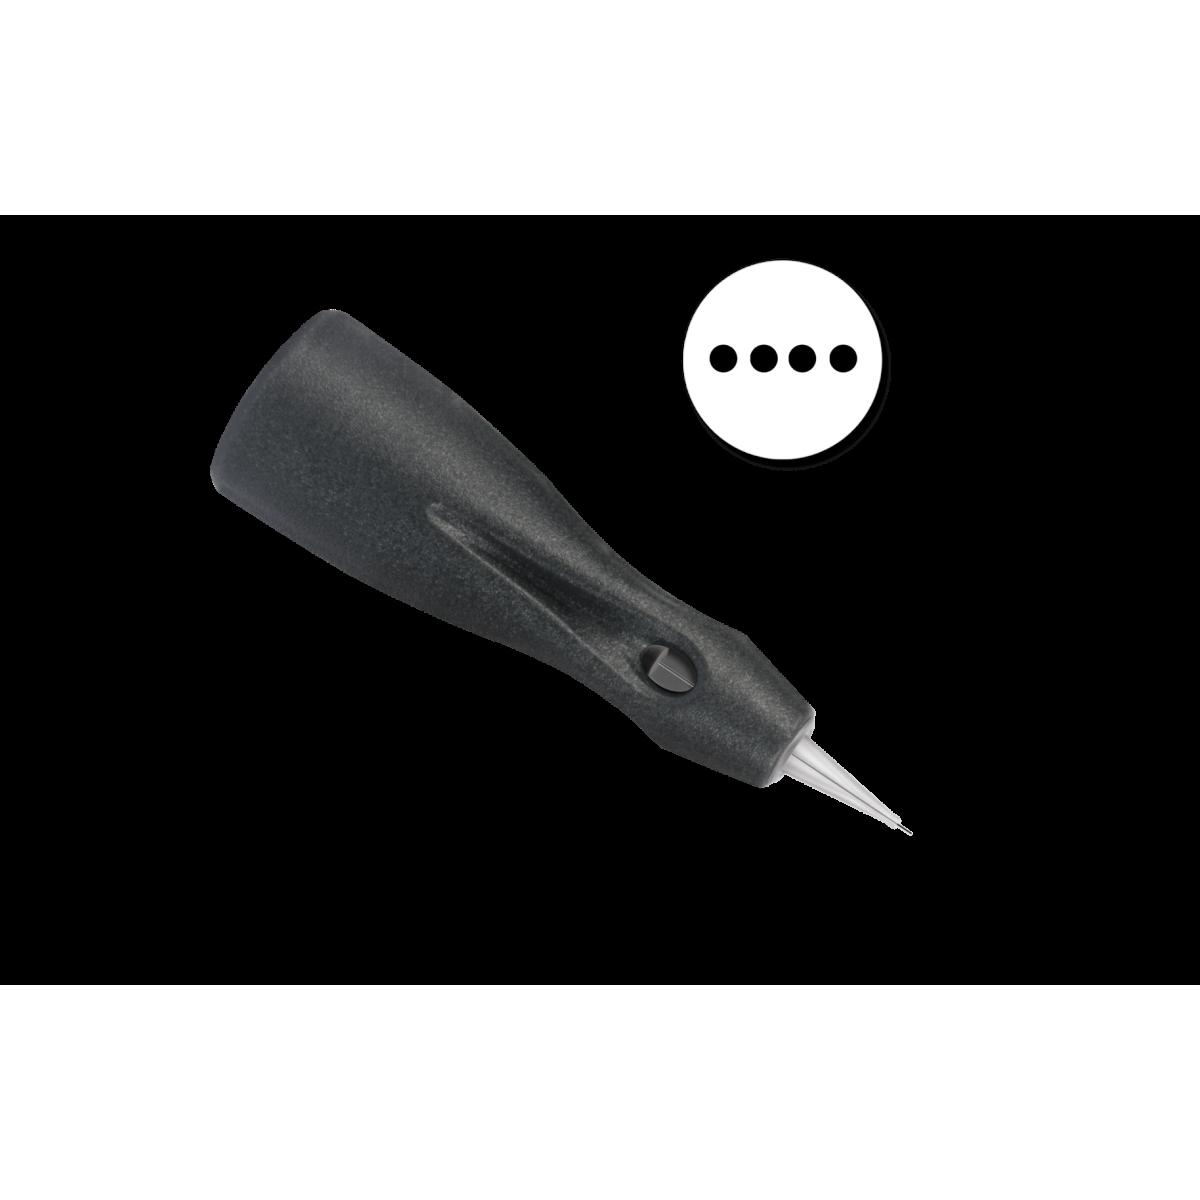 POUR EASY LINE - MODULE 4 FLAT (0,35 mm) EASY LINE AMIEA